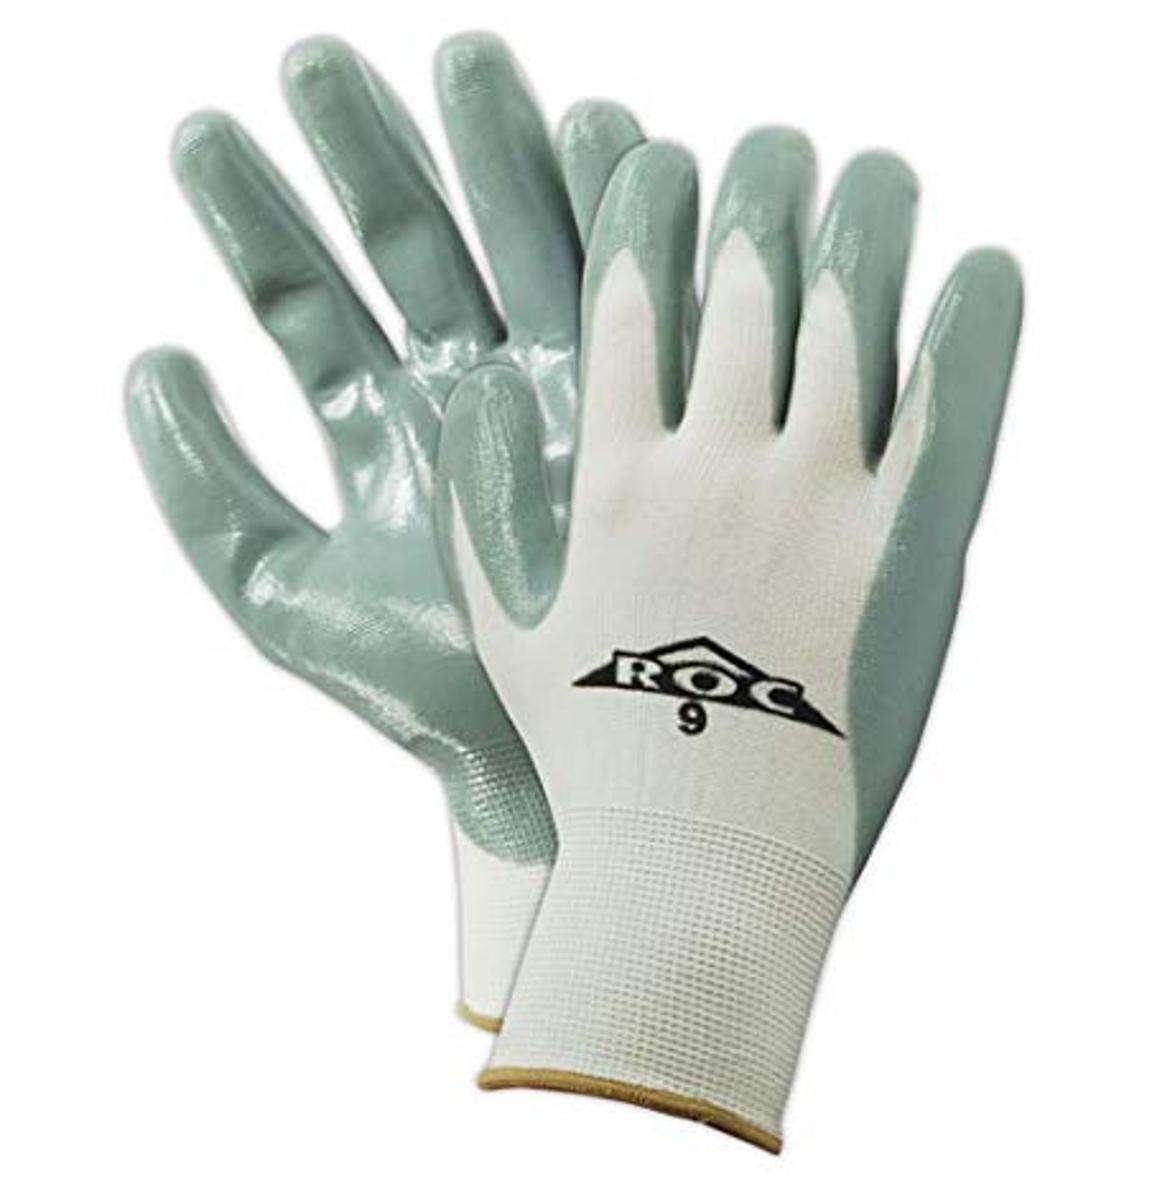 MAGID ROC GP160 Nylon Glove, Gray Nitrile Palm Coating, Knit Wrist Cuff, 10